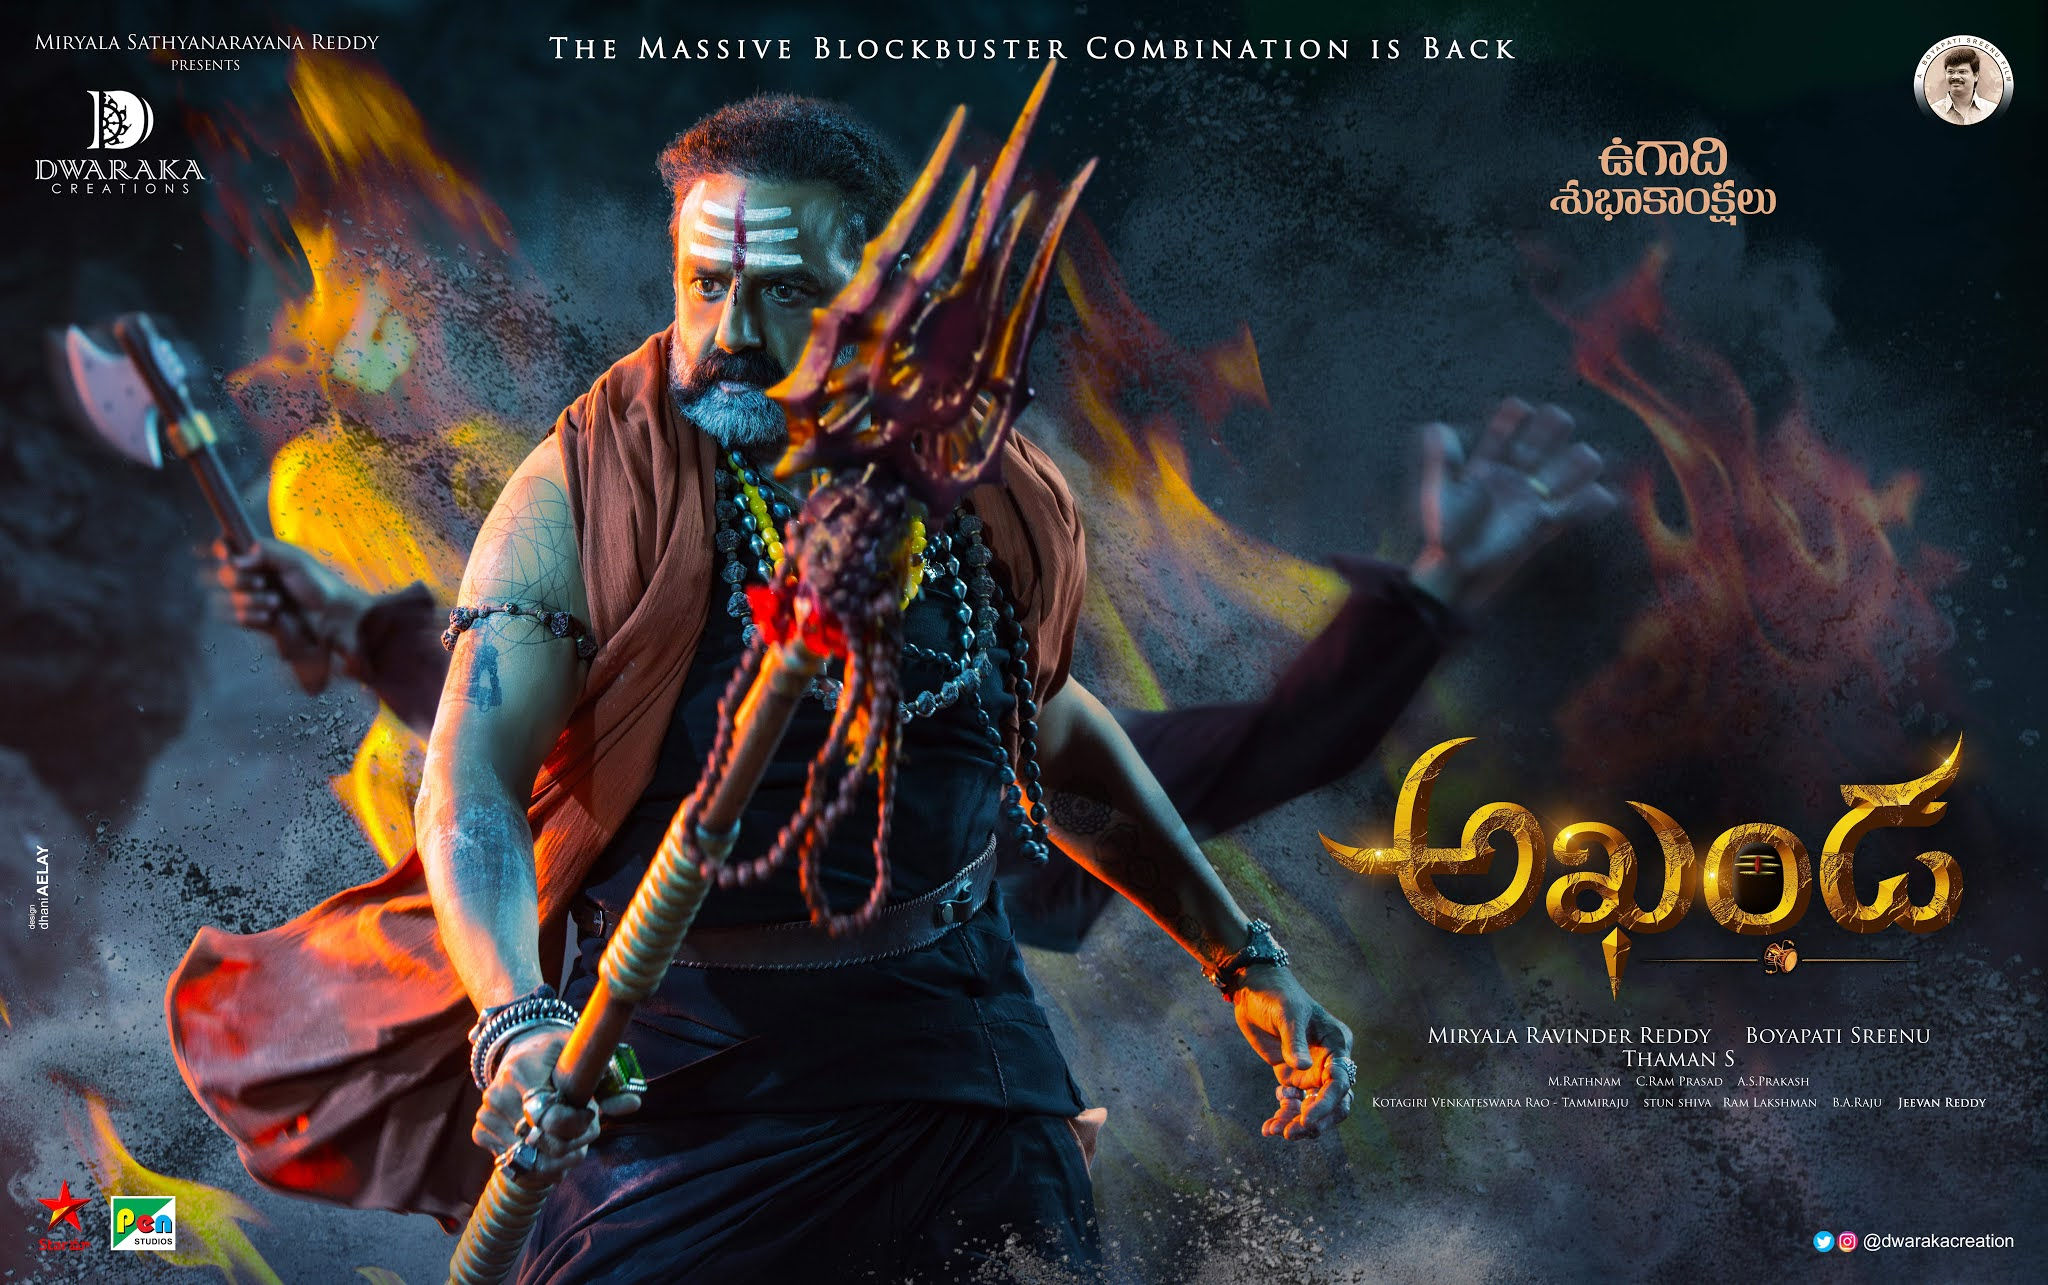 Nandamuri Balakrishna Akhanda Movie First Look HD Poster Wallpaper